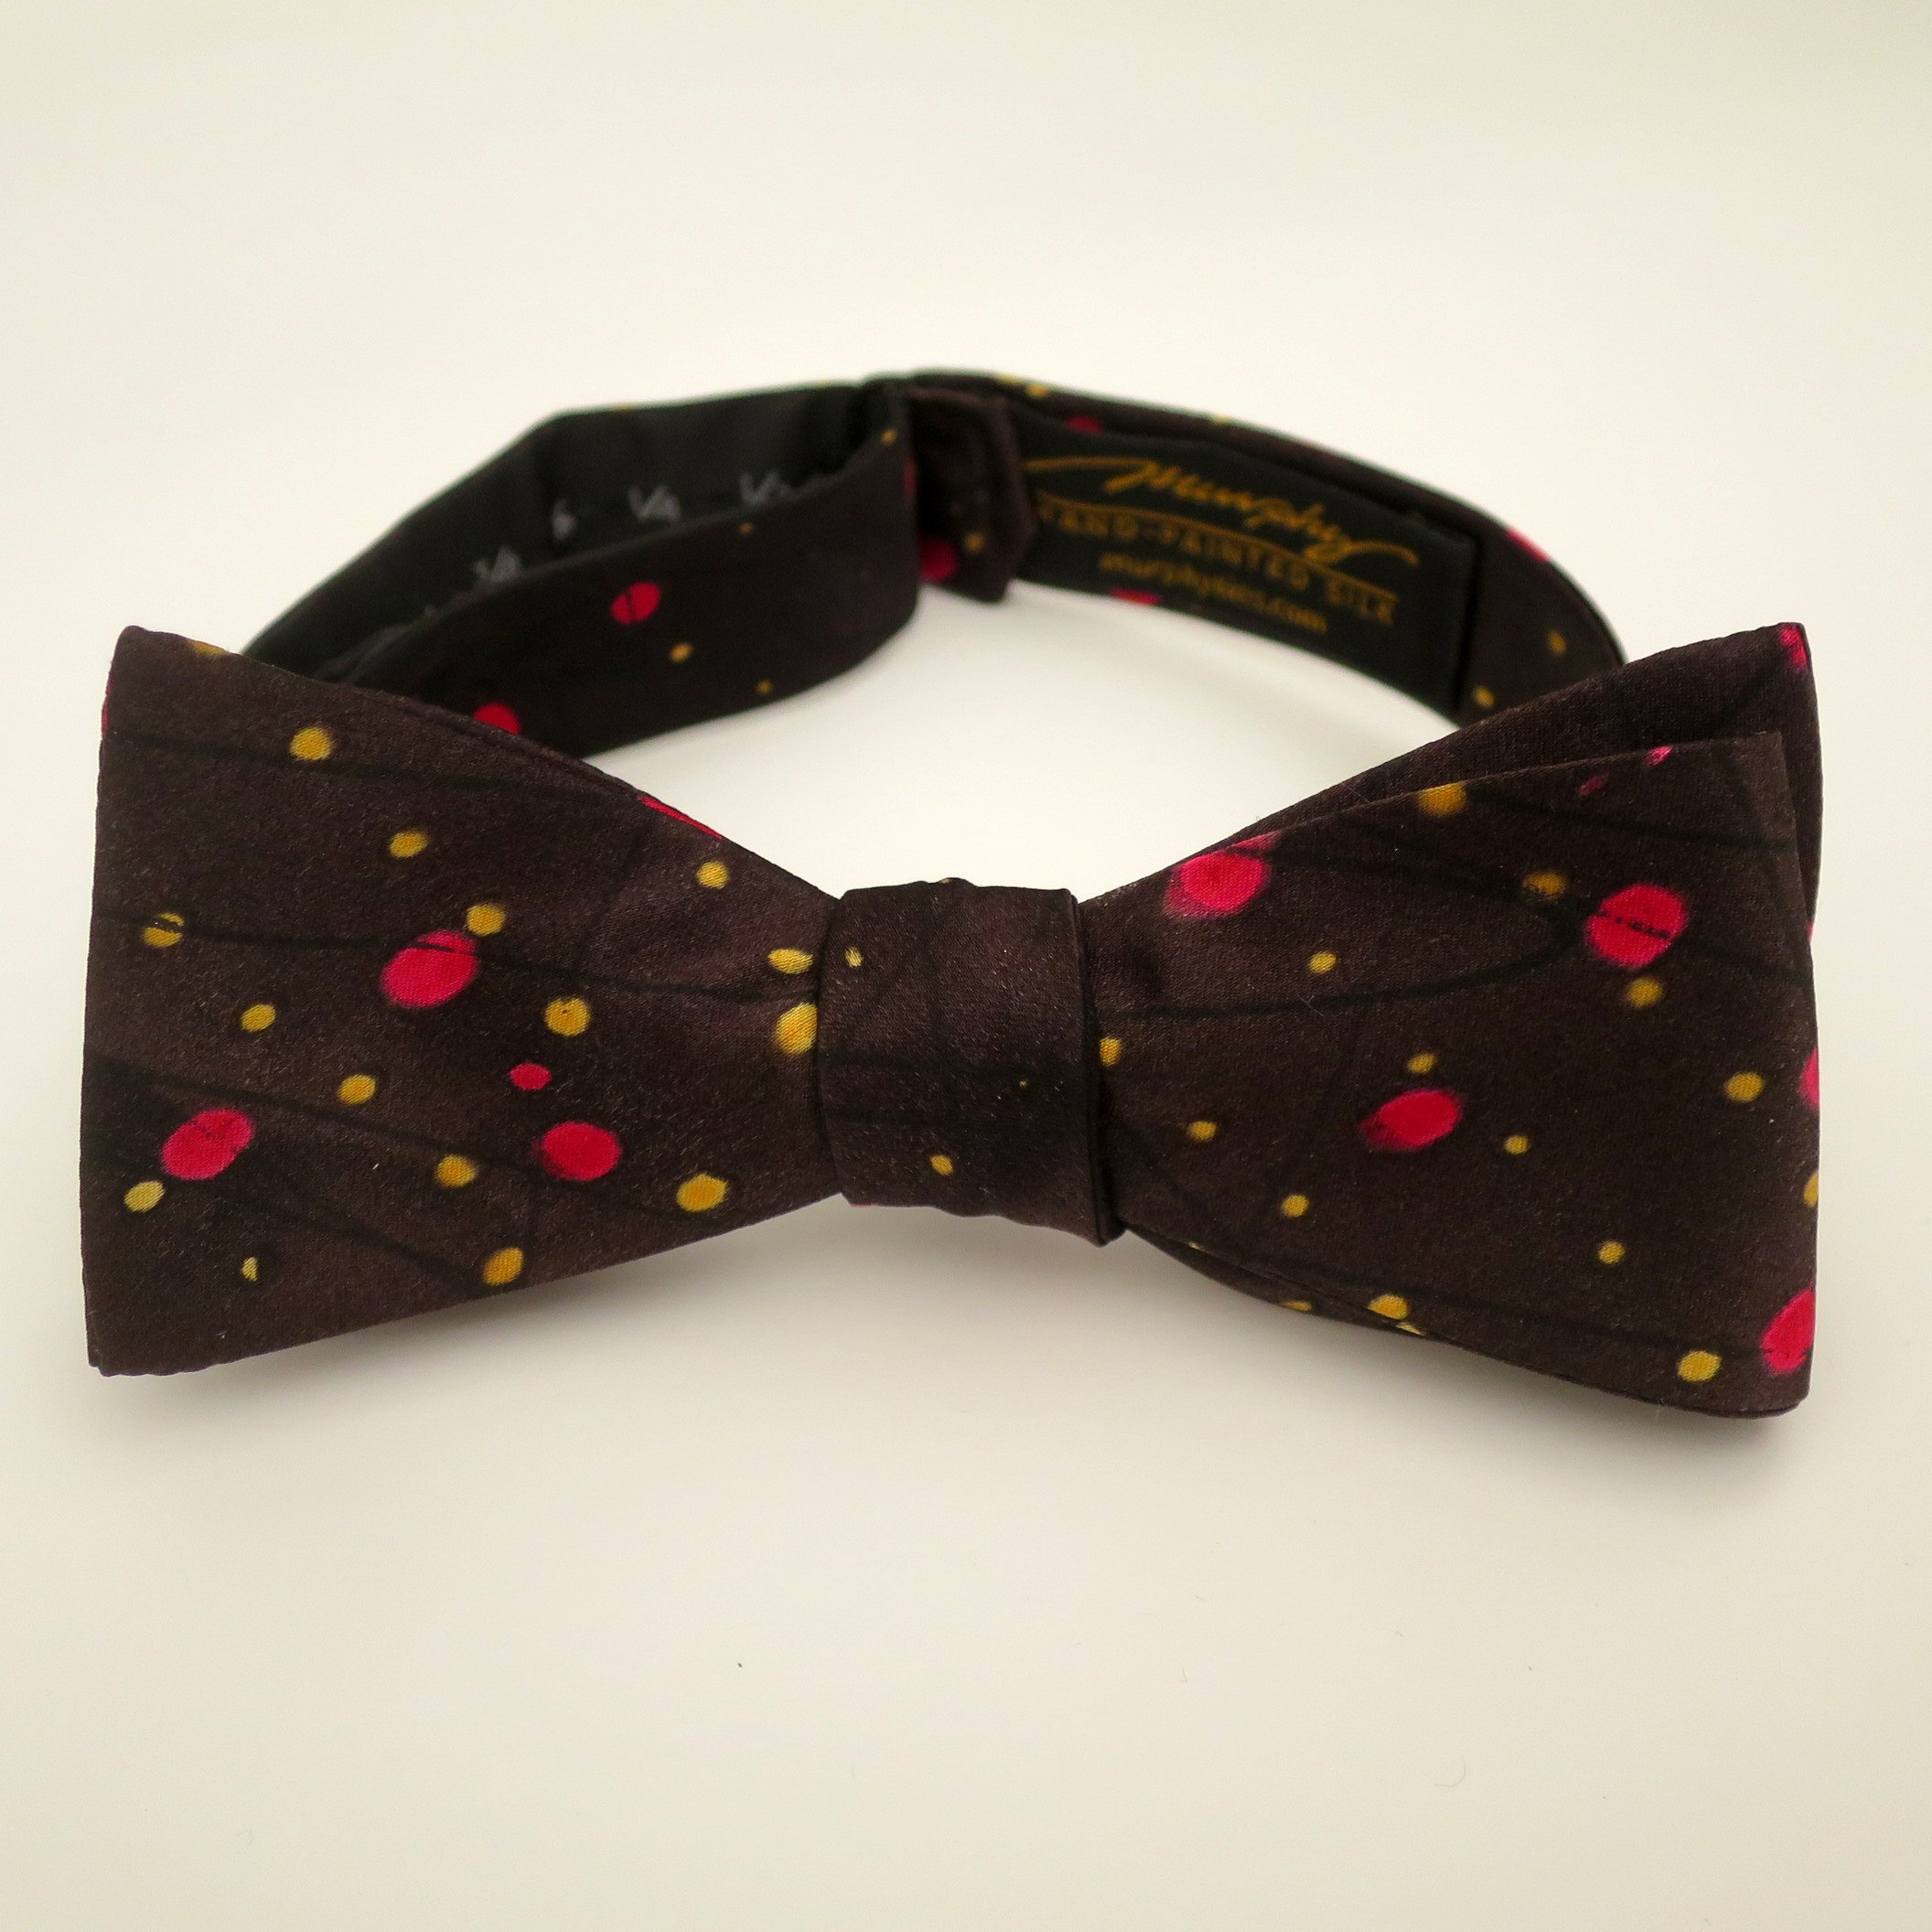 100% Silk Hand-Painted Hand-Made Men's Self Tie Bow Tie ''Constellation'' Art to Wear by Murphyties